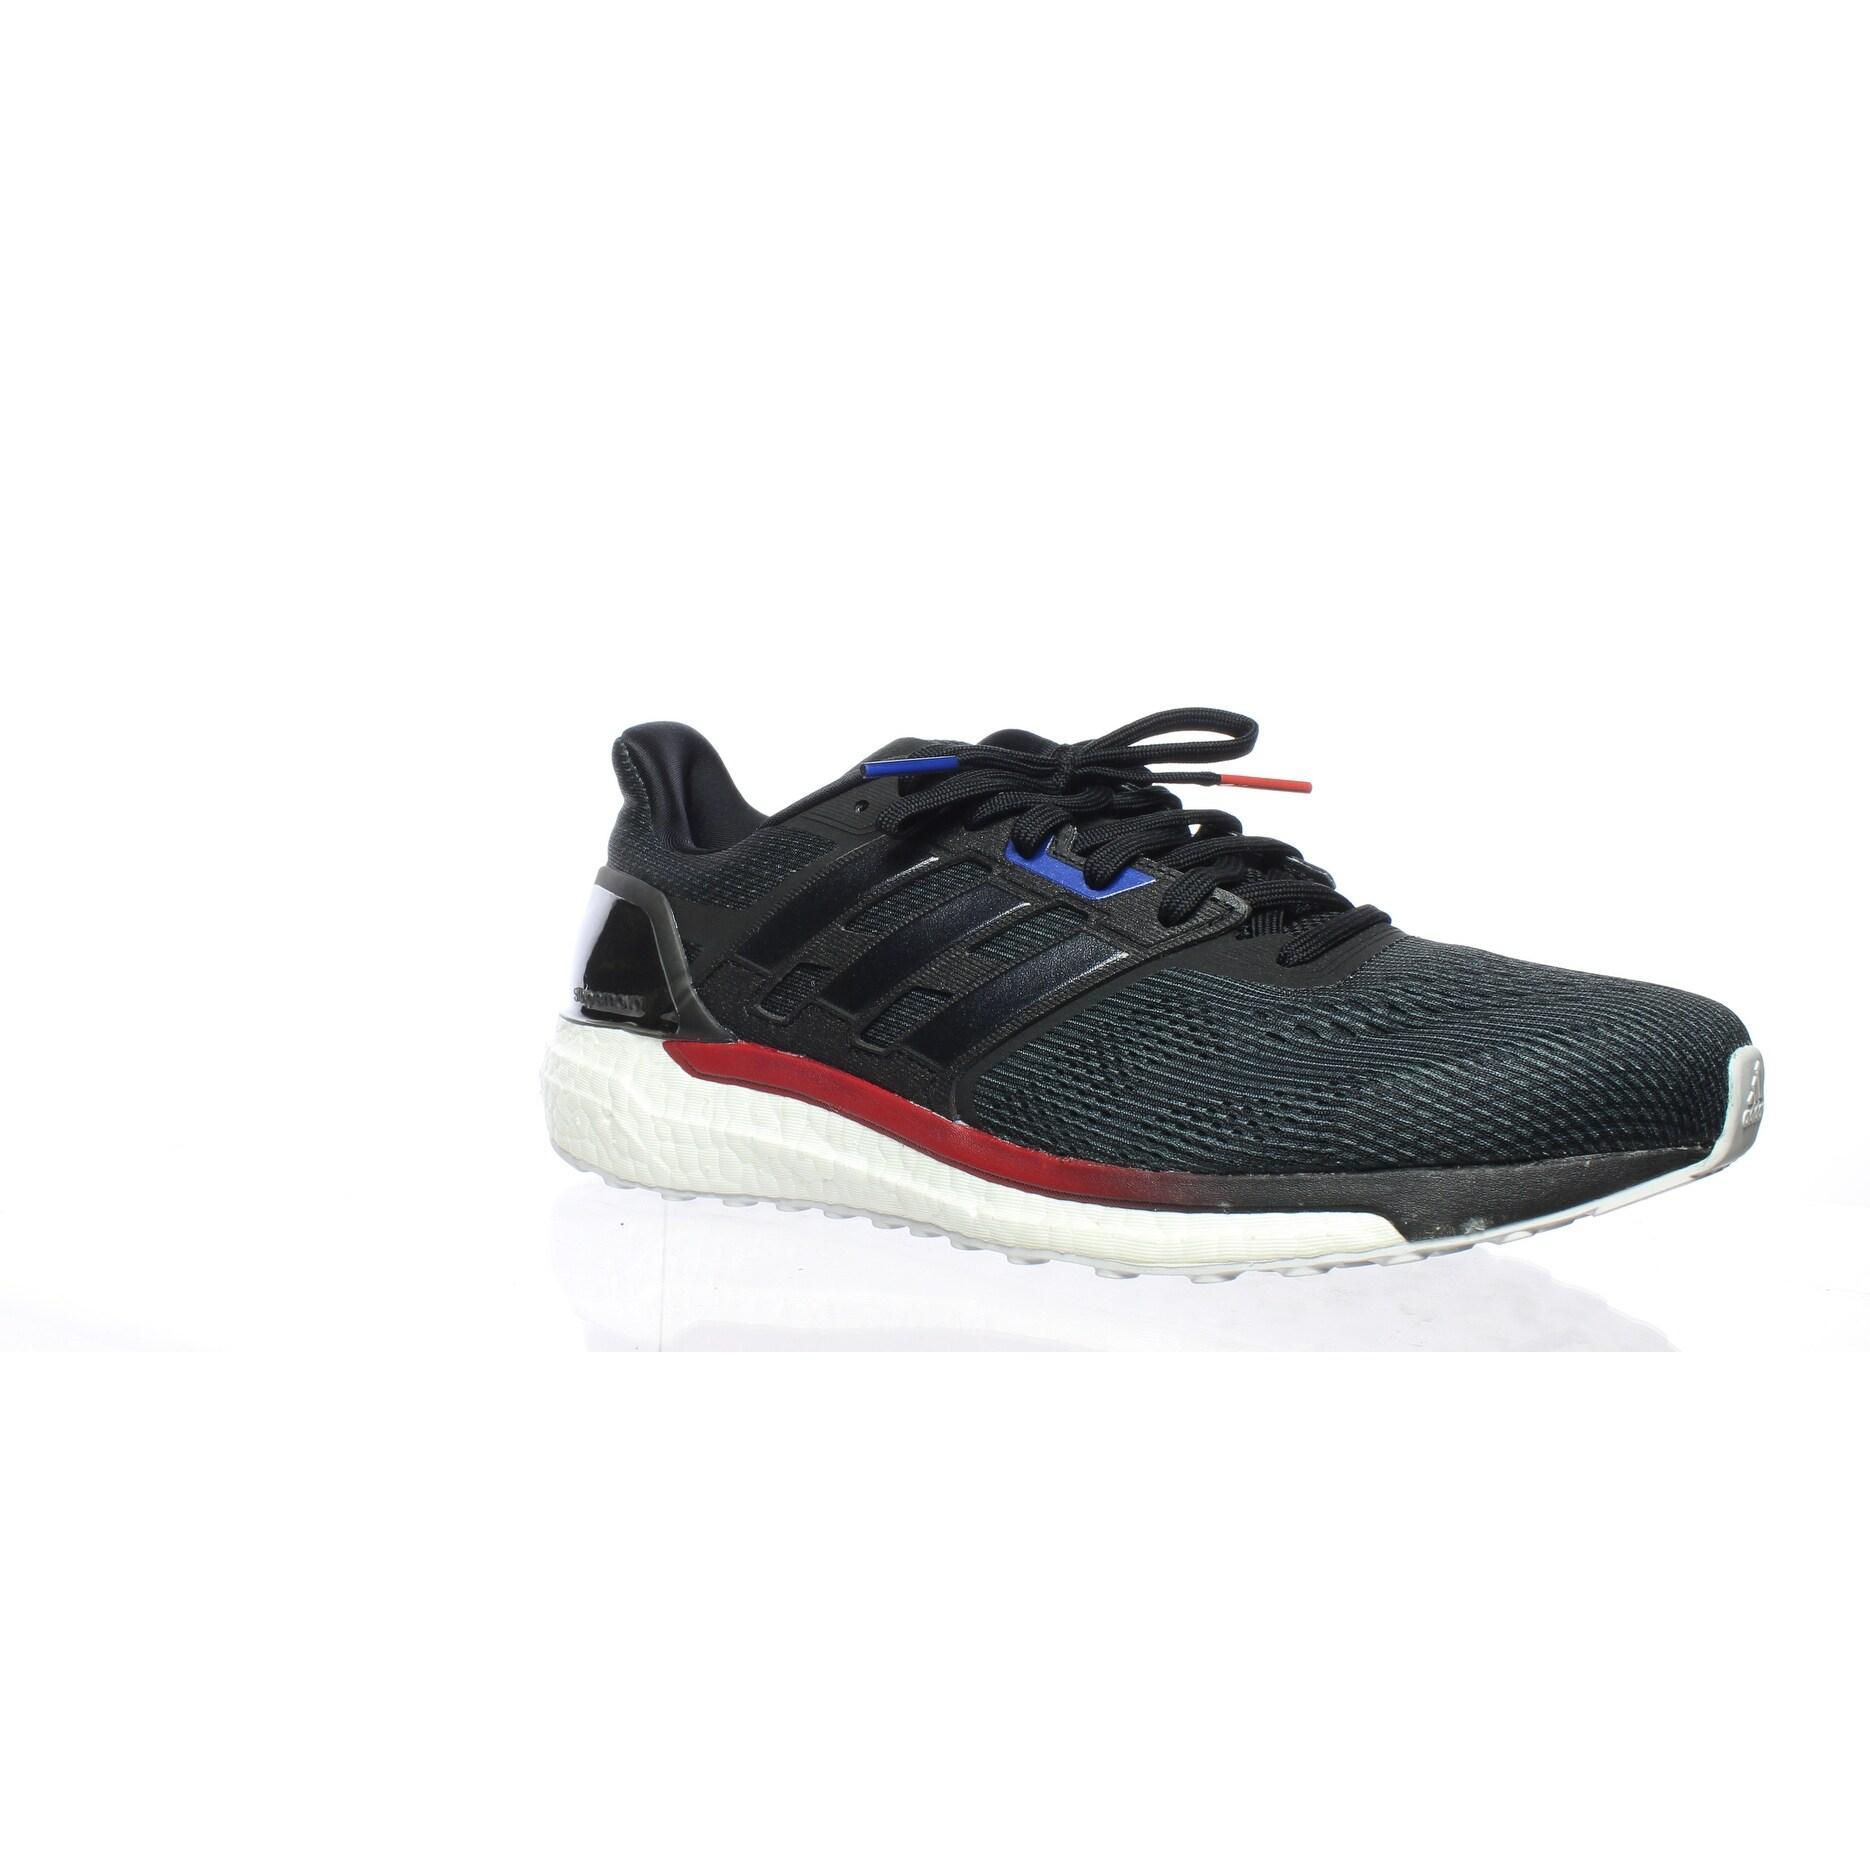 b6eb4d331e798 Shop Adidas Mens Supernova Aktiv Black Running Shoes Size 10.5 ...